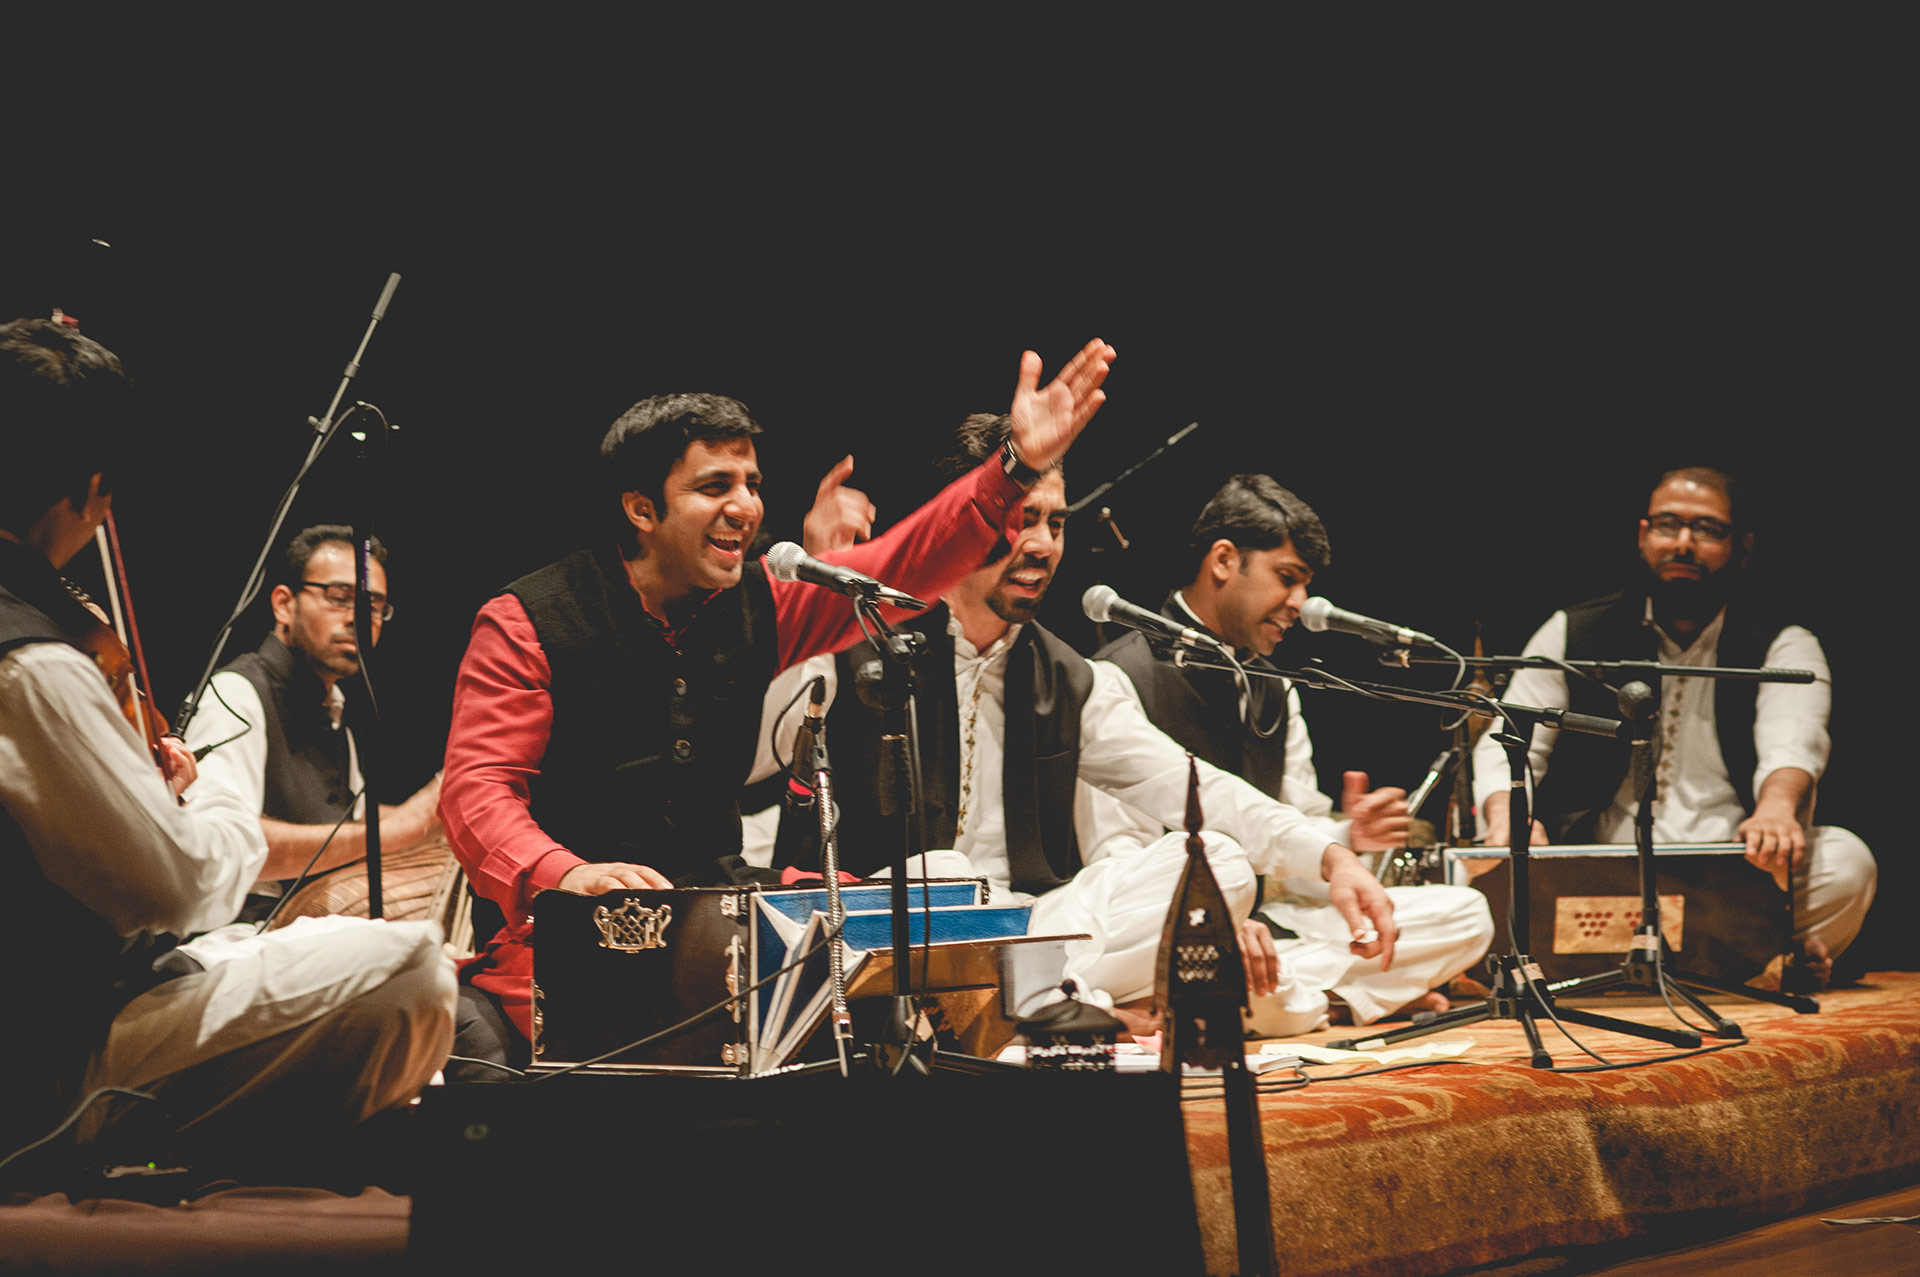 Riyaaz Qawwali to perform ancient, mystical music at UHCL Bayou Theater